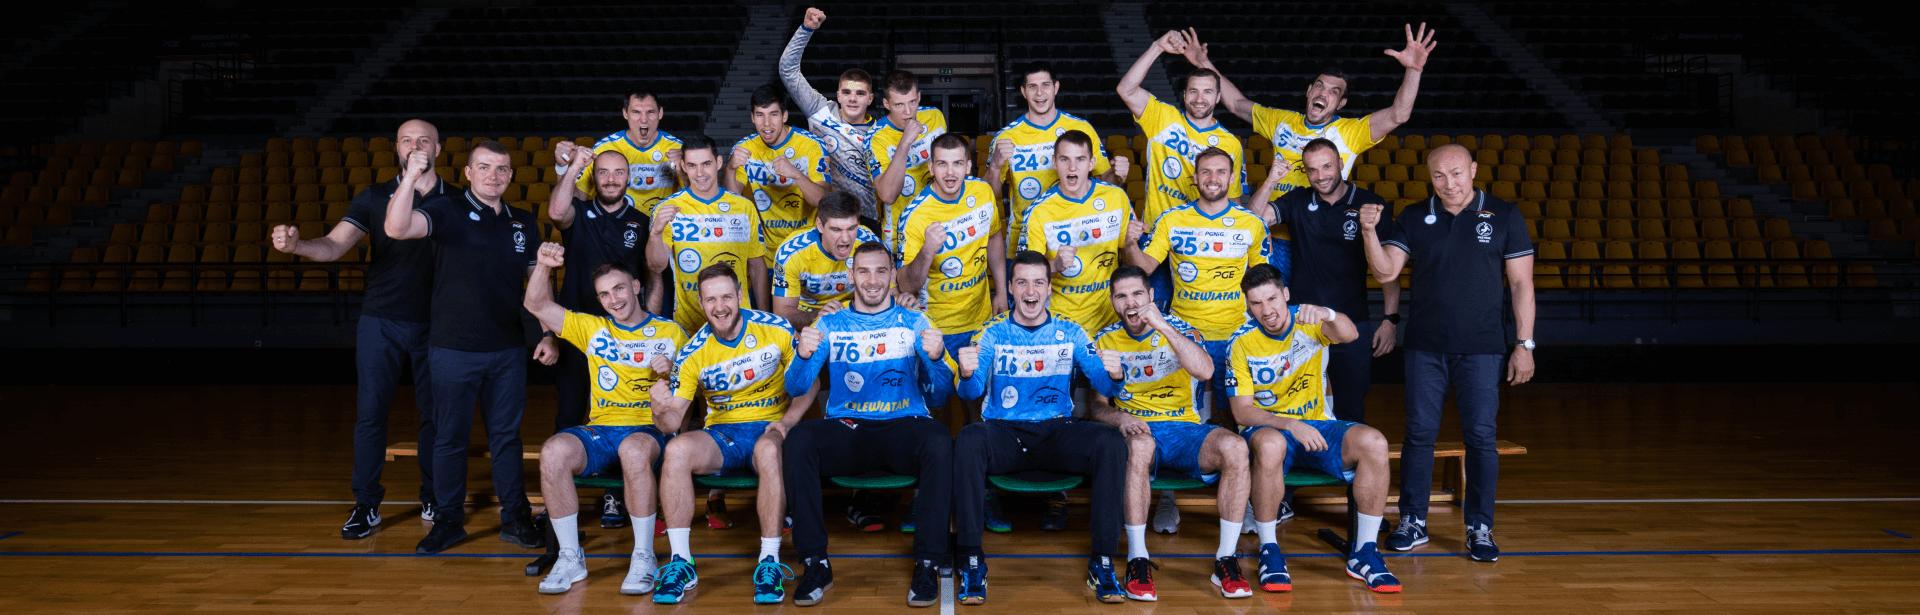 PGE VIVE Kielce 2018/2019